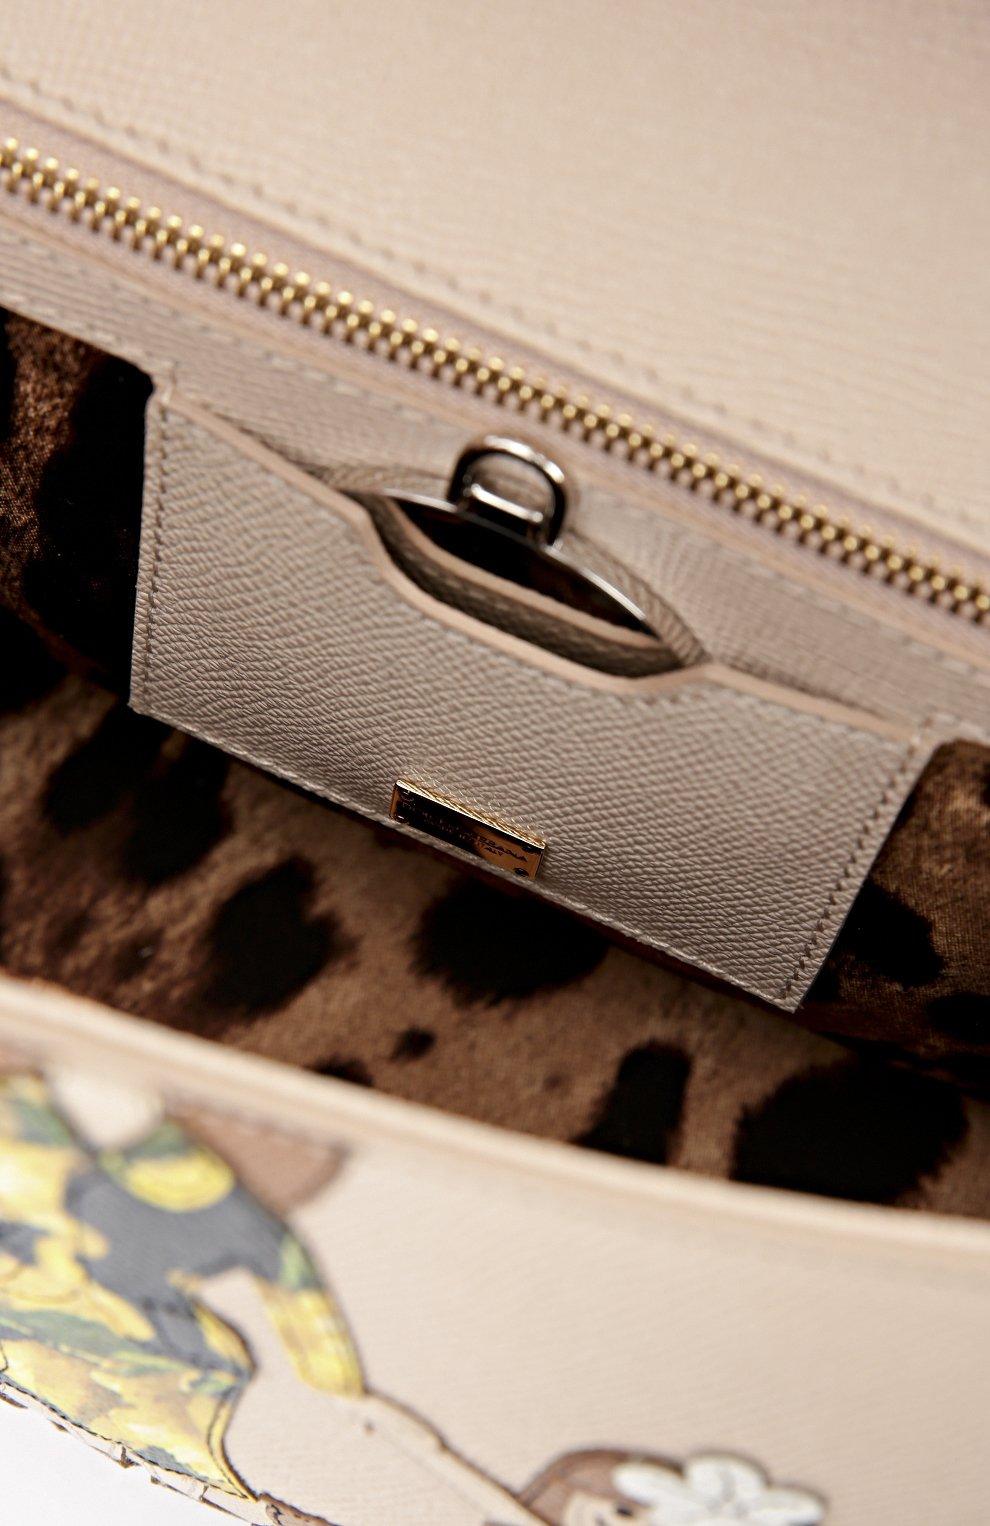 Сумка Sicily medium new с аппликацией DG FAMILY Dolce & Gabbana бежевая цвета | Фото №4